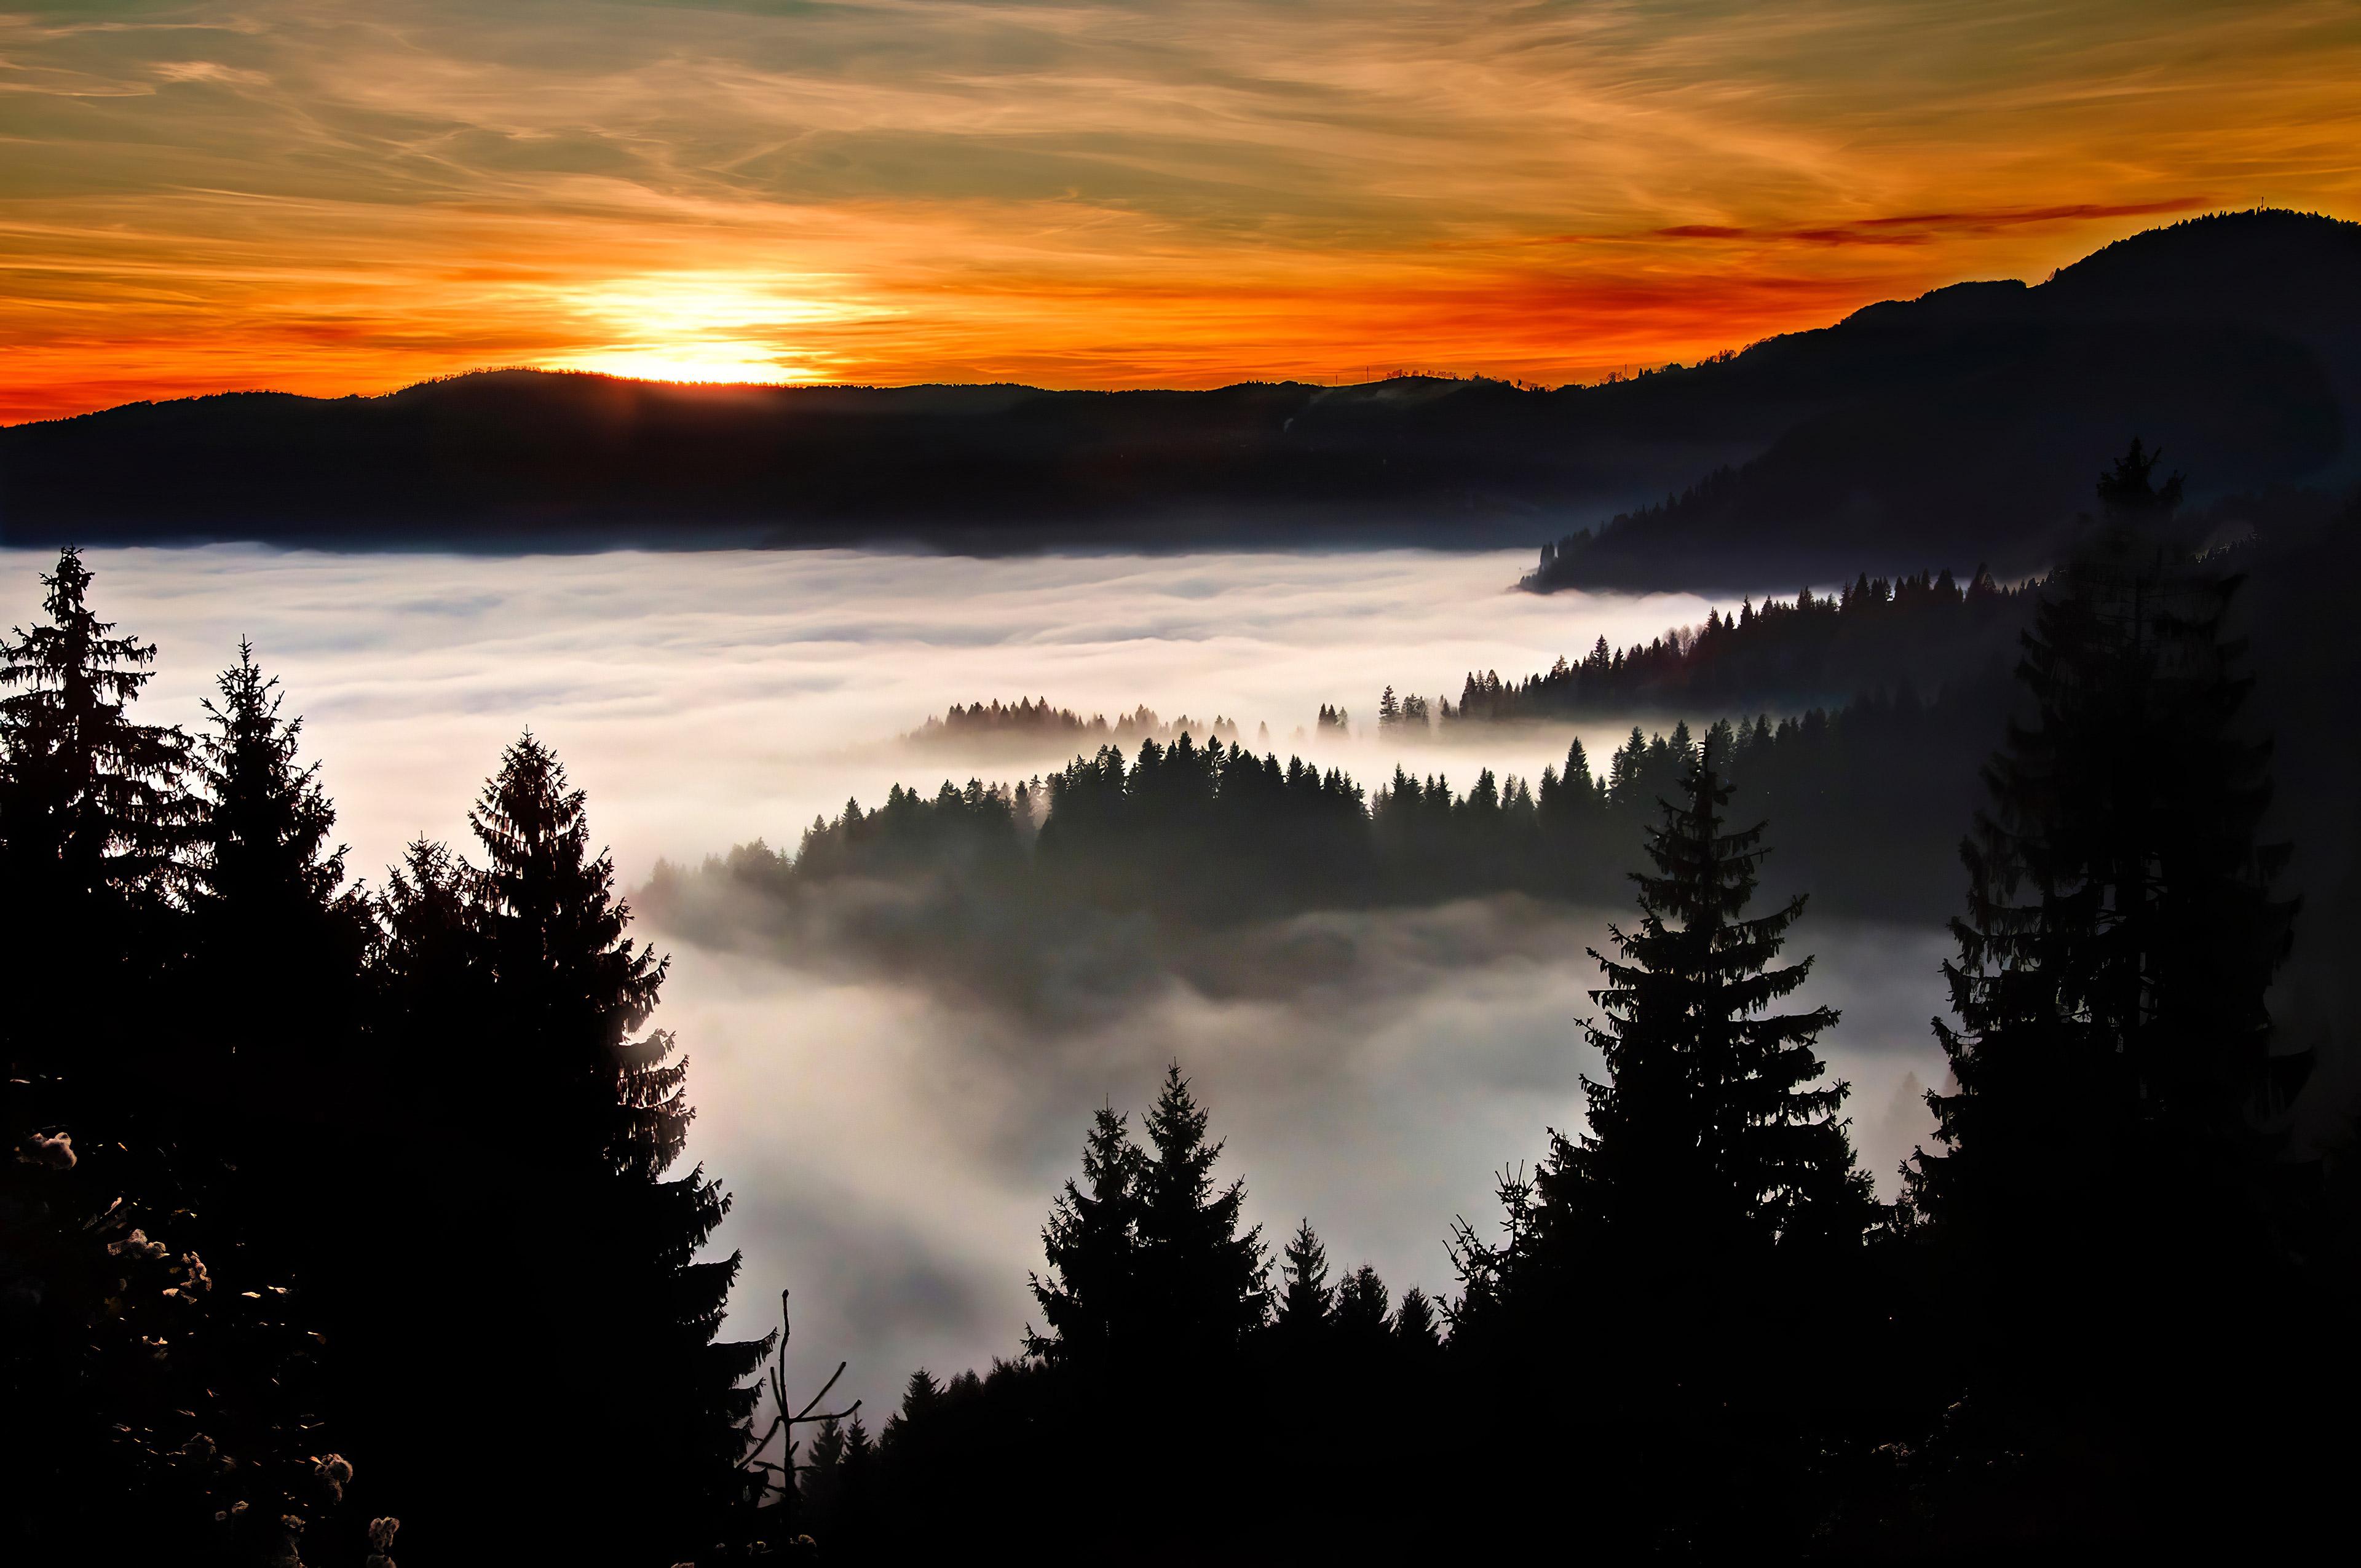 trees covered in clouds 1574937482 - Trees Covered In Clouds -